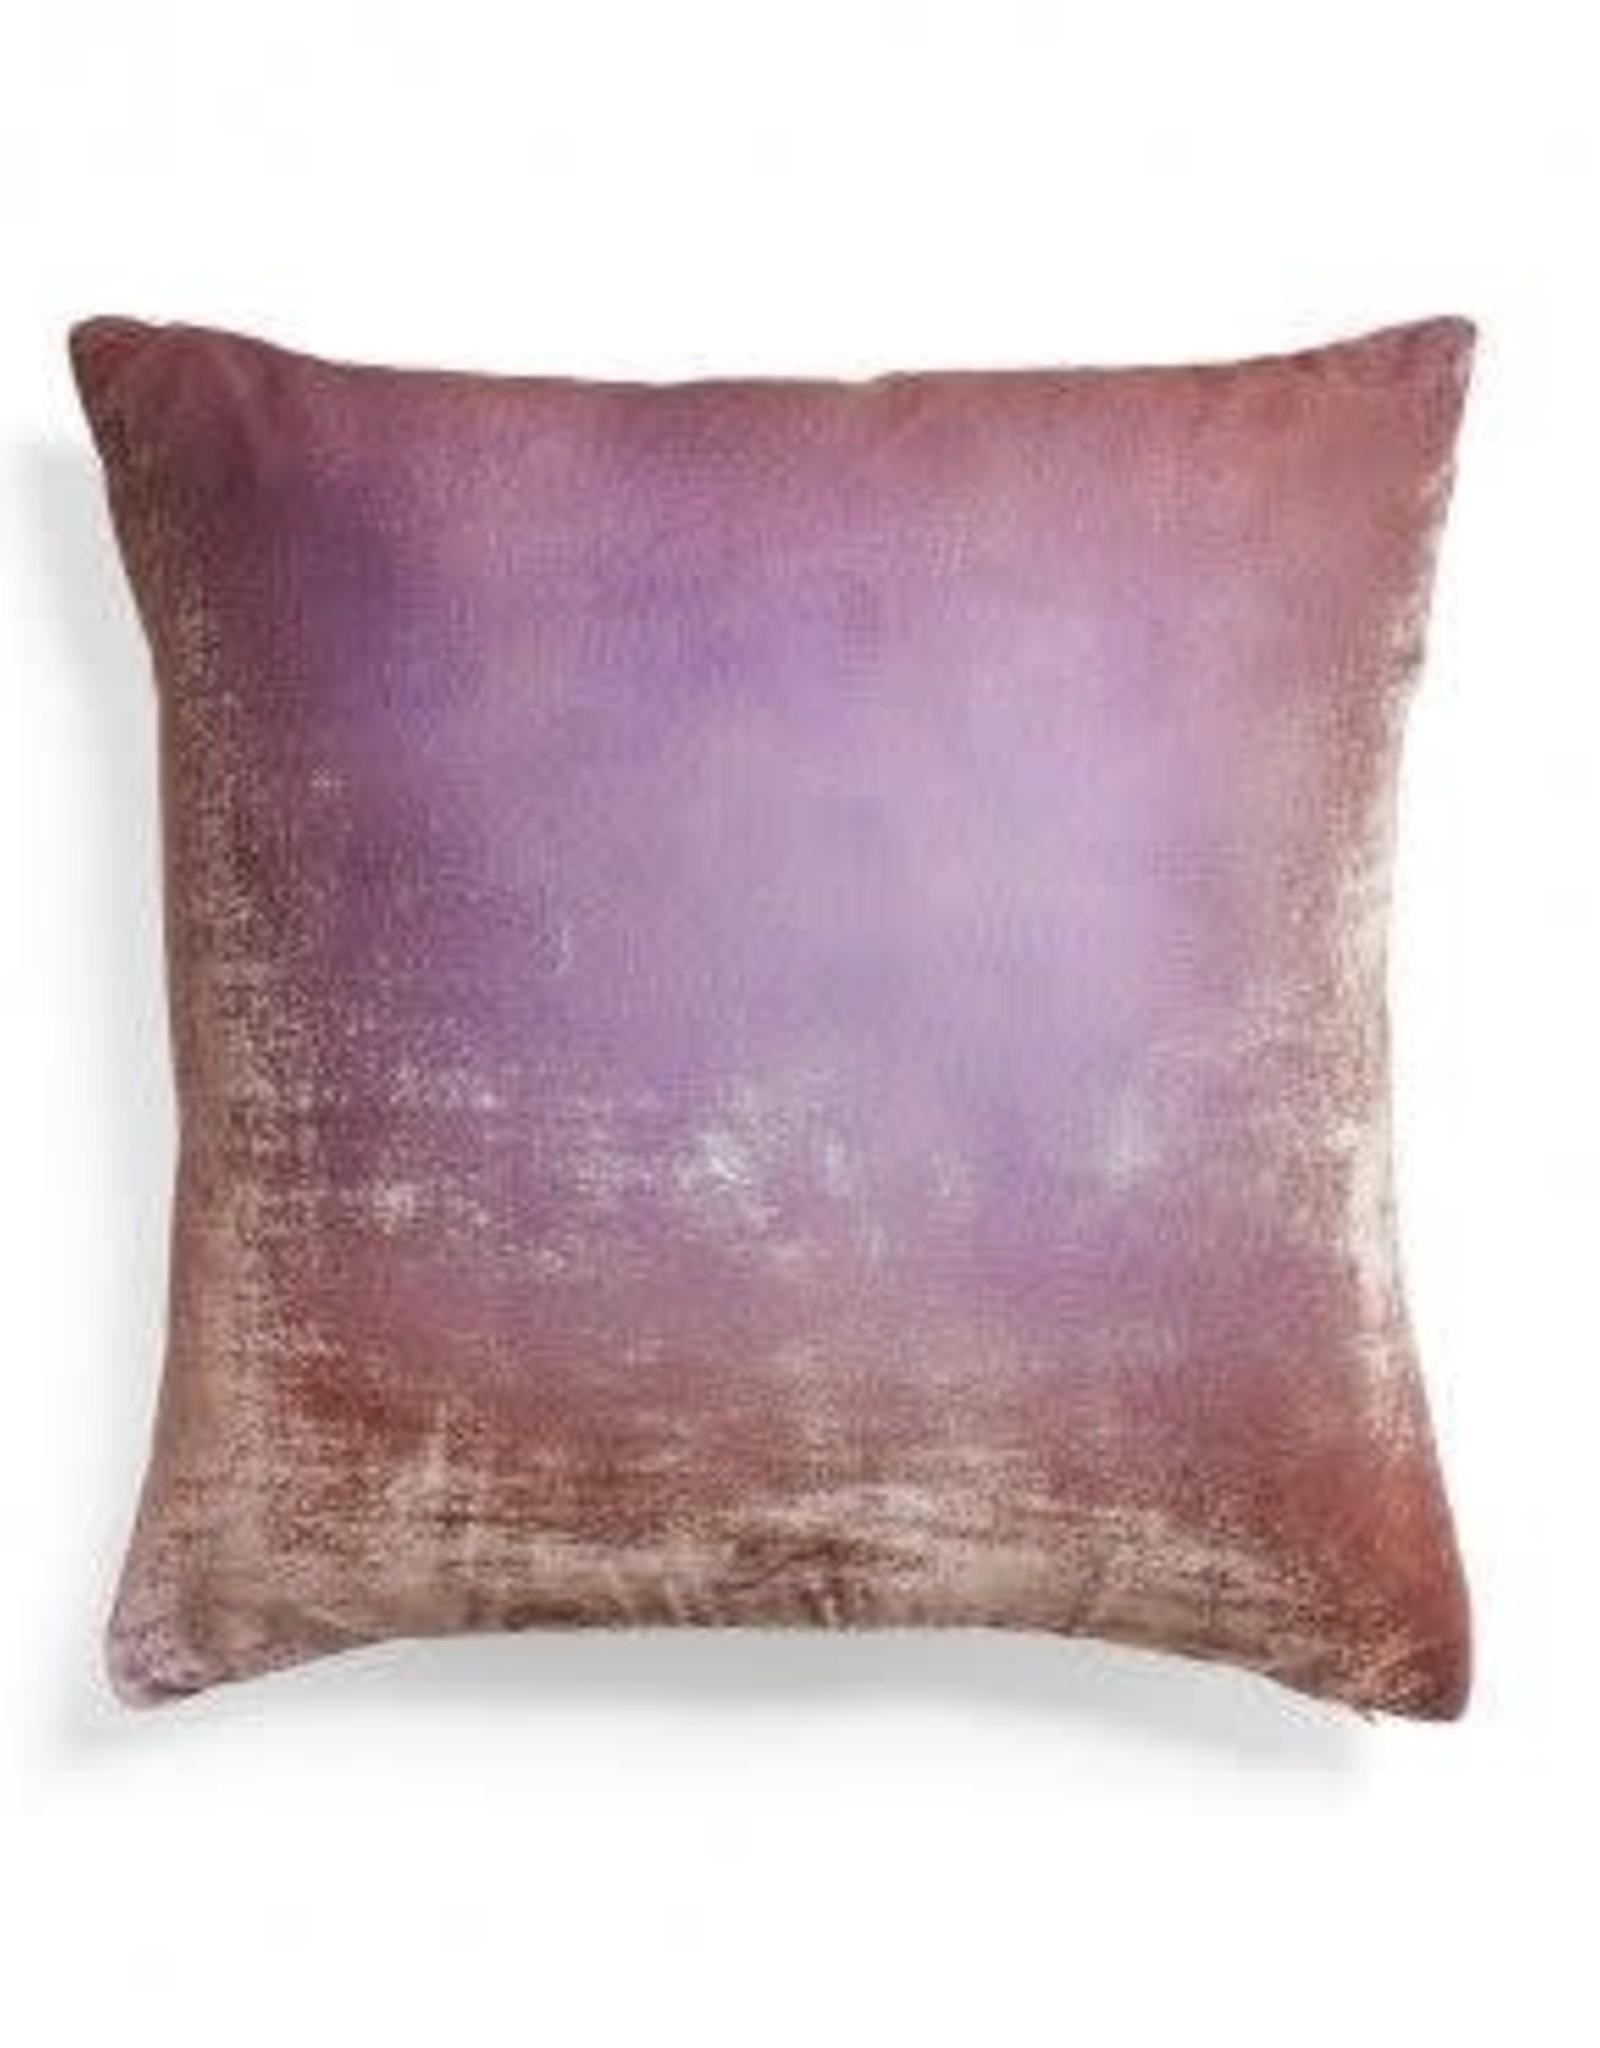 Kevin O'Brien Studio Ombre Silk Velvet Pillow - Lilac + Gold